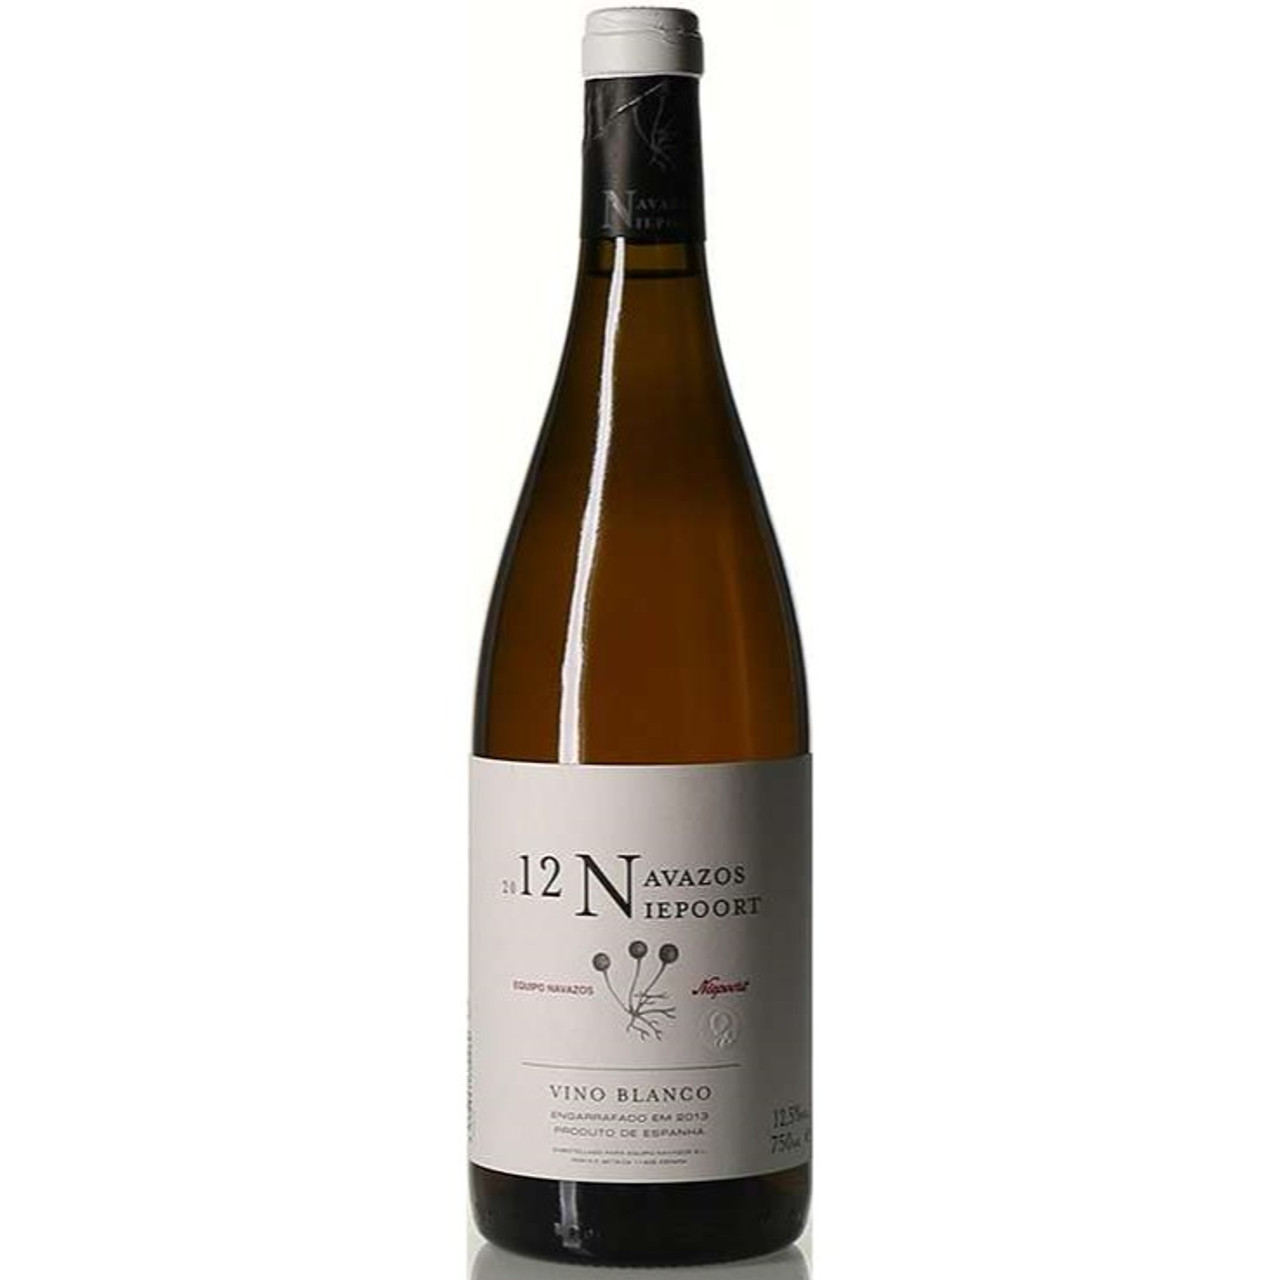 Navazos Niepoort Vino Blanco 2012